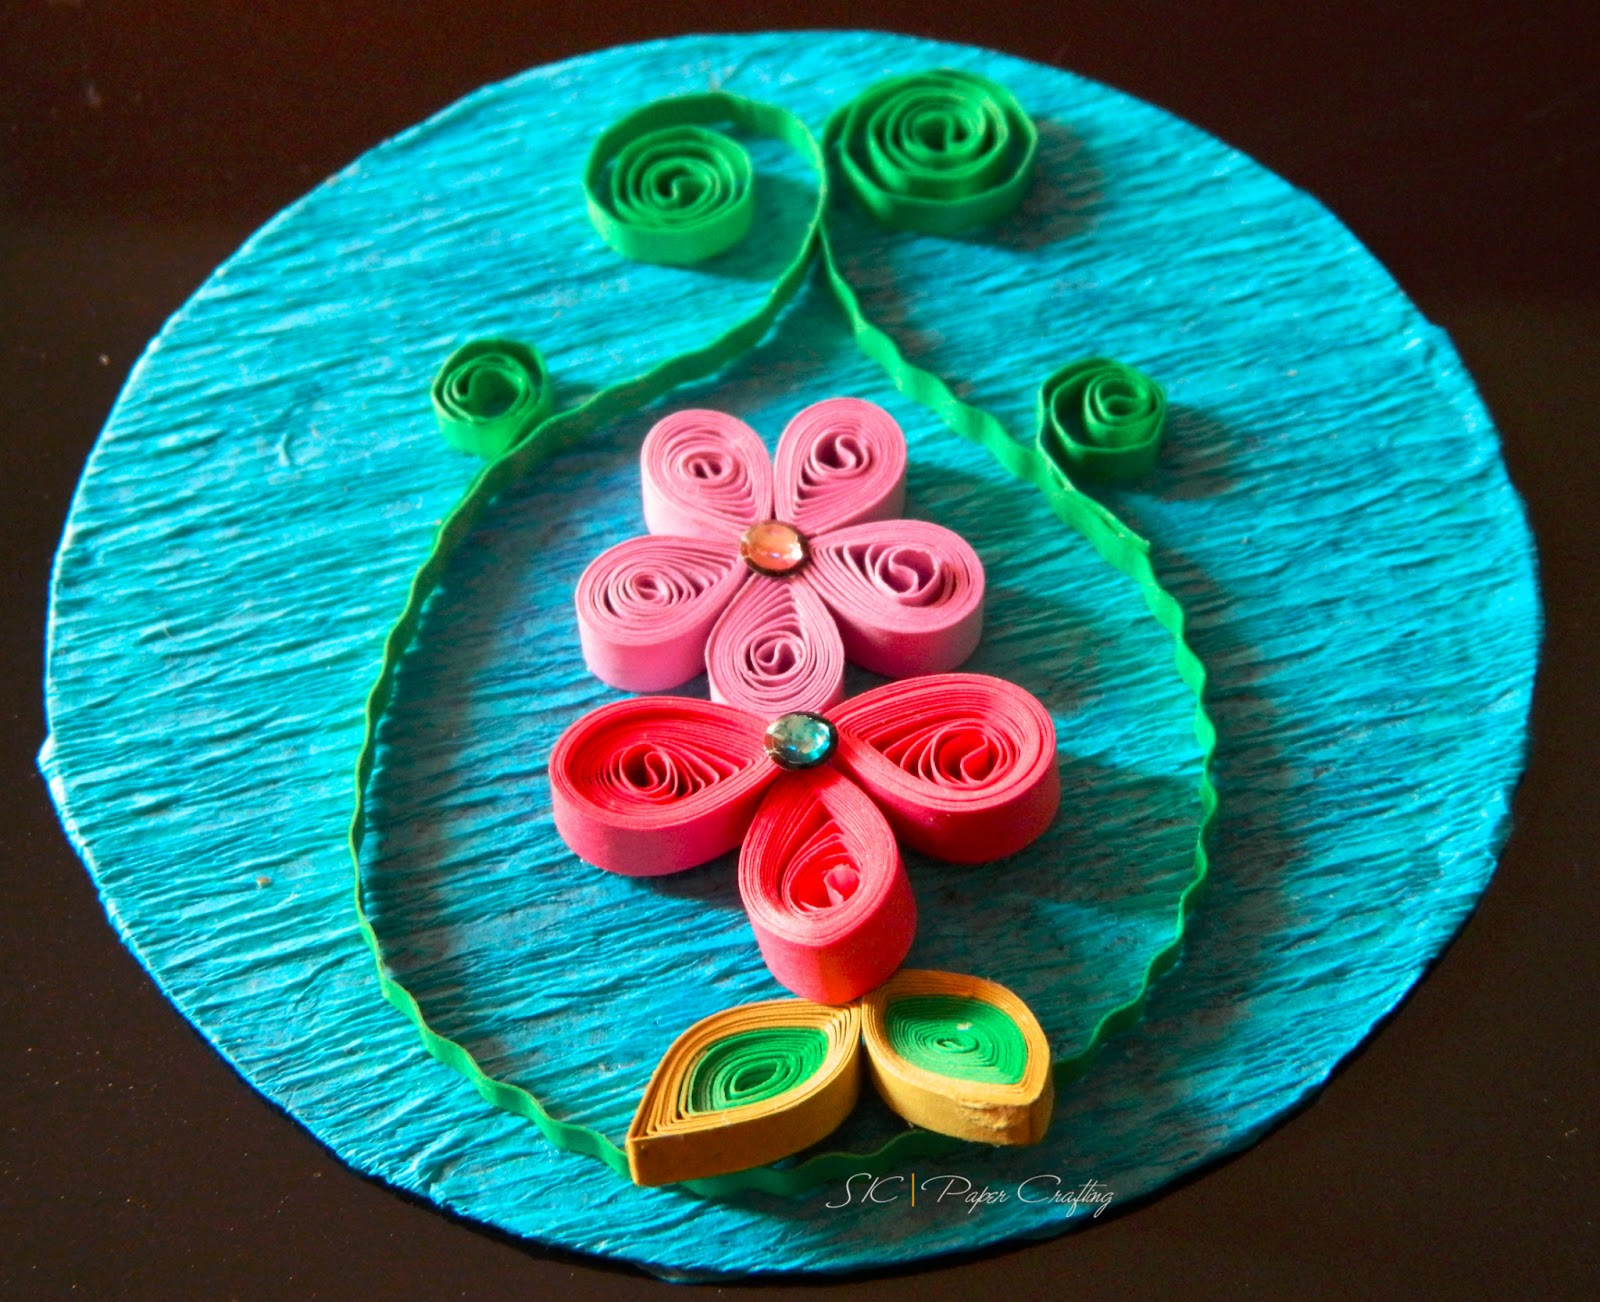 Random Design Creative Art Craft Work